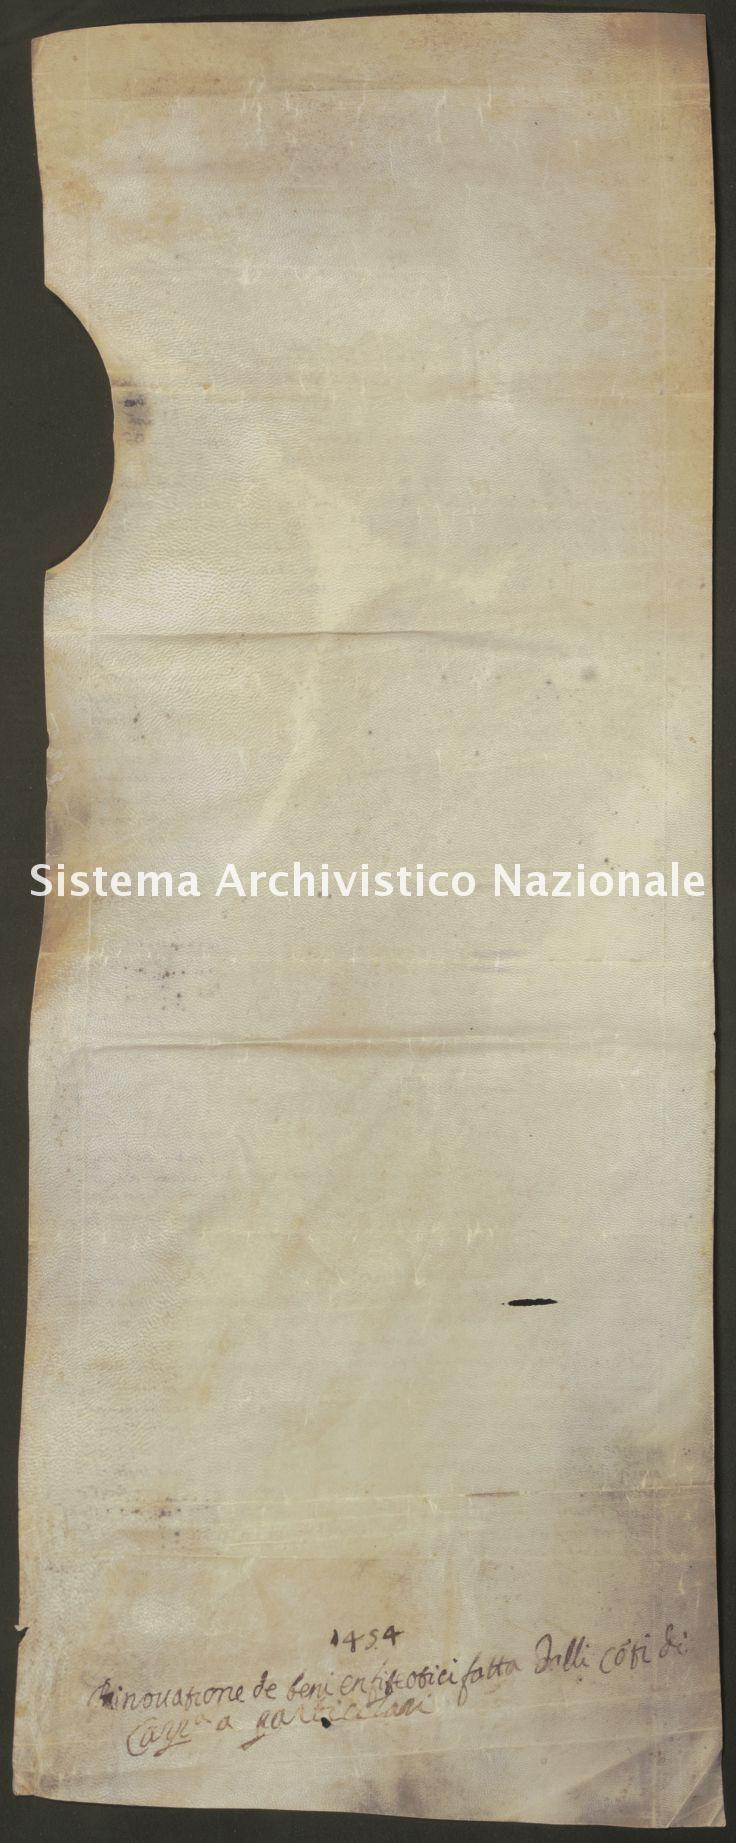 032. Carpegna Falconieri Gabrielli, Scavolino pergamena n. 32v